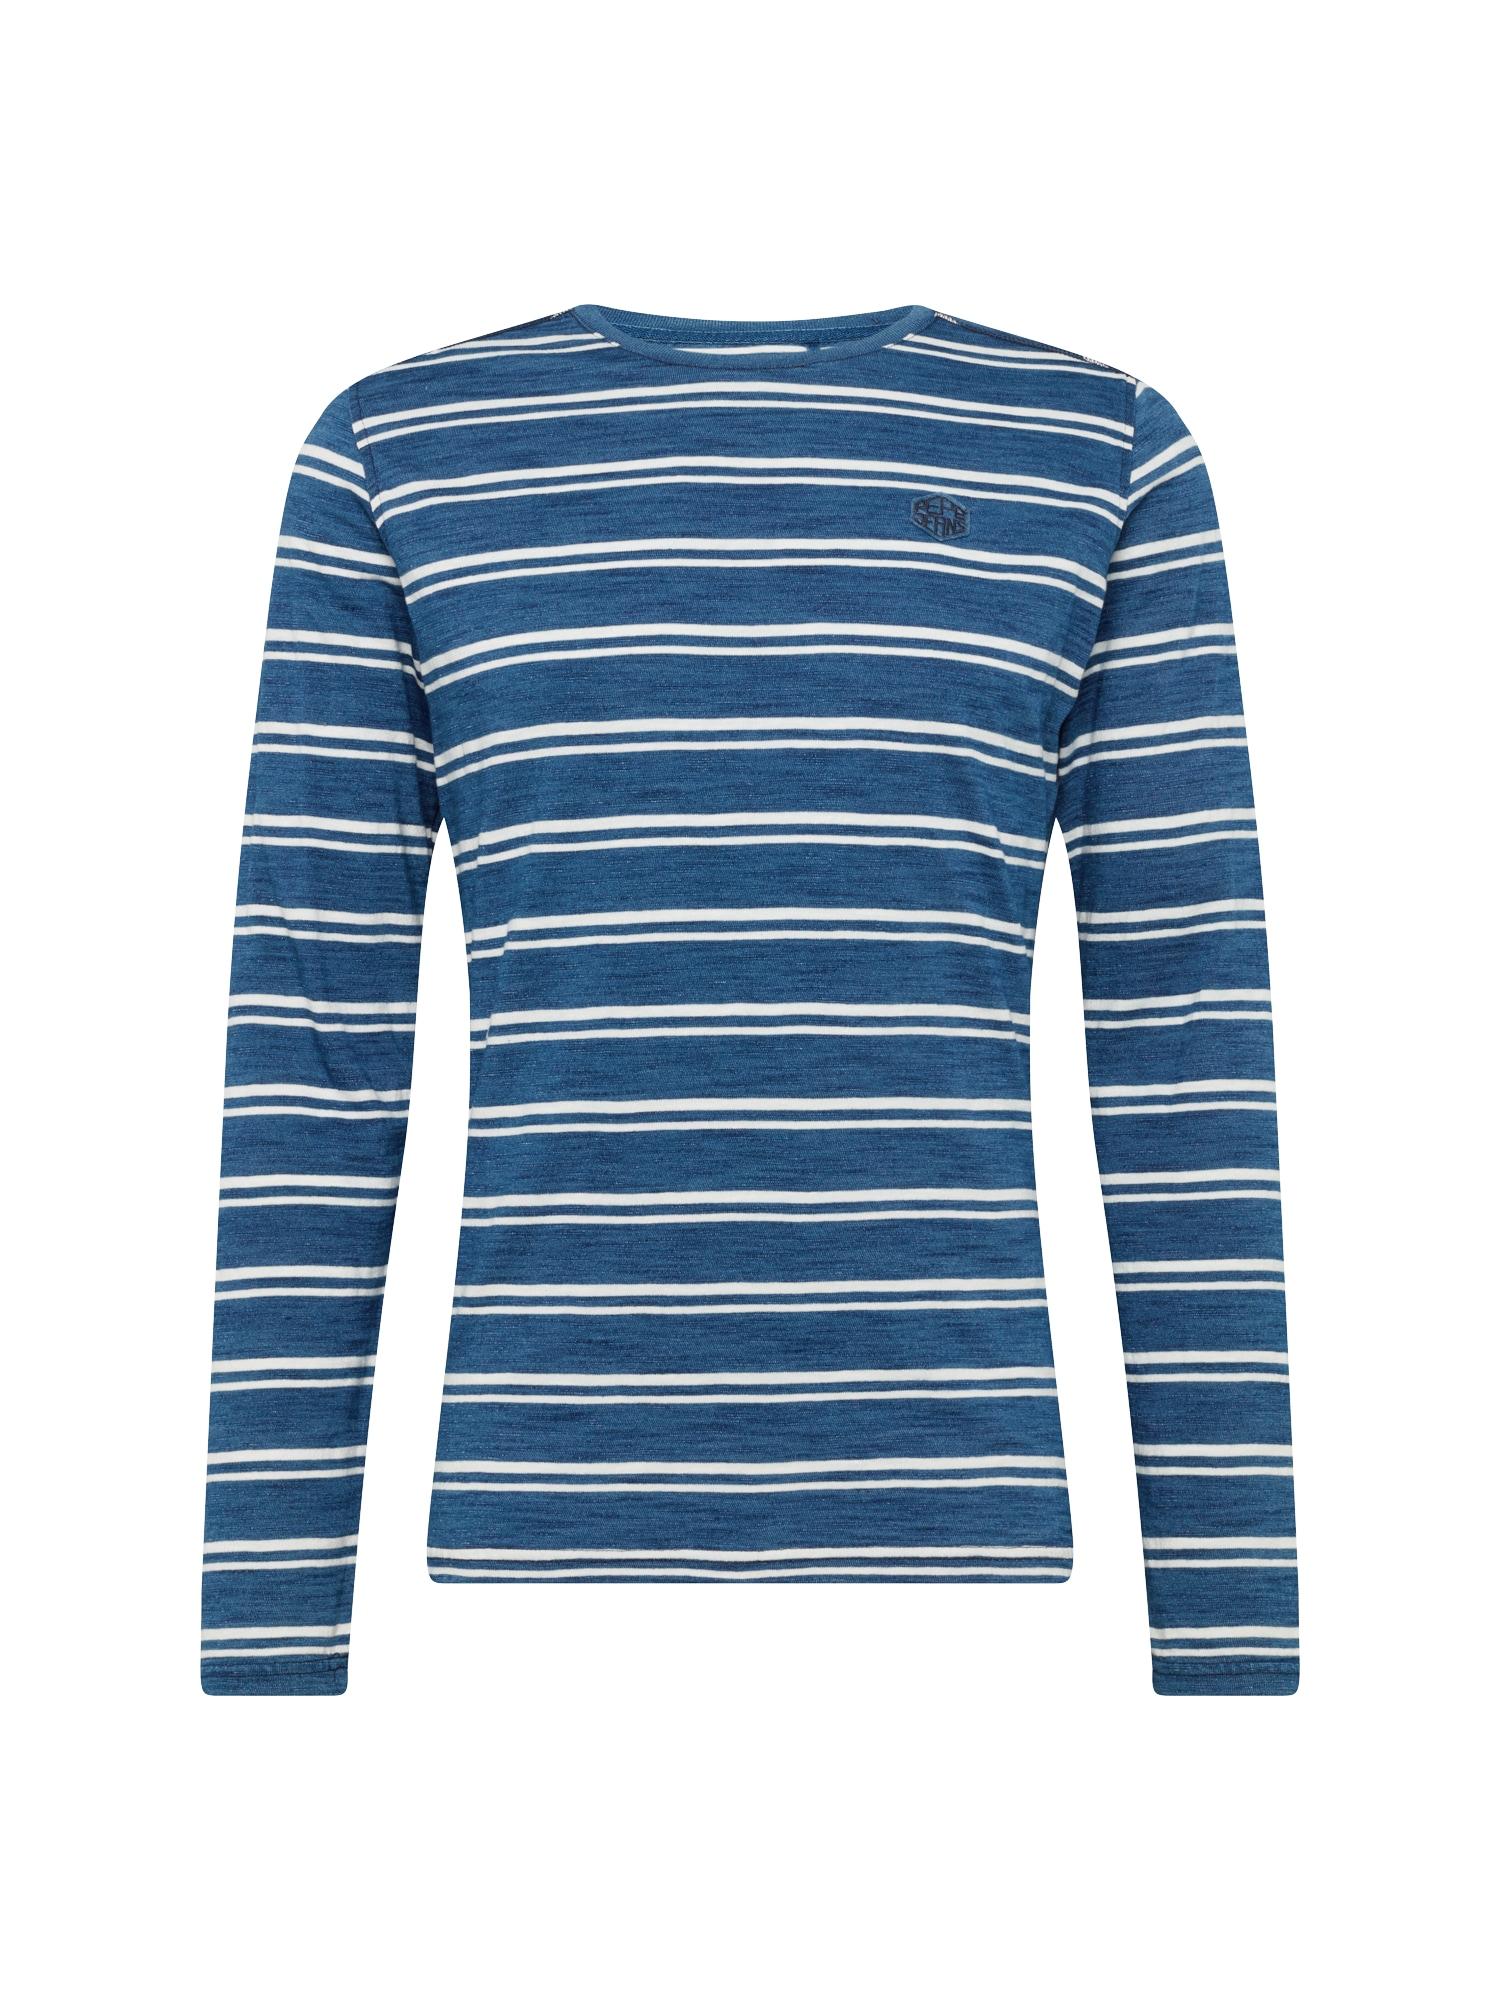 Tričko JARED tmavě modrá červená Pepe Jeans